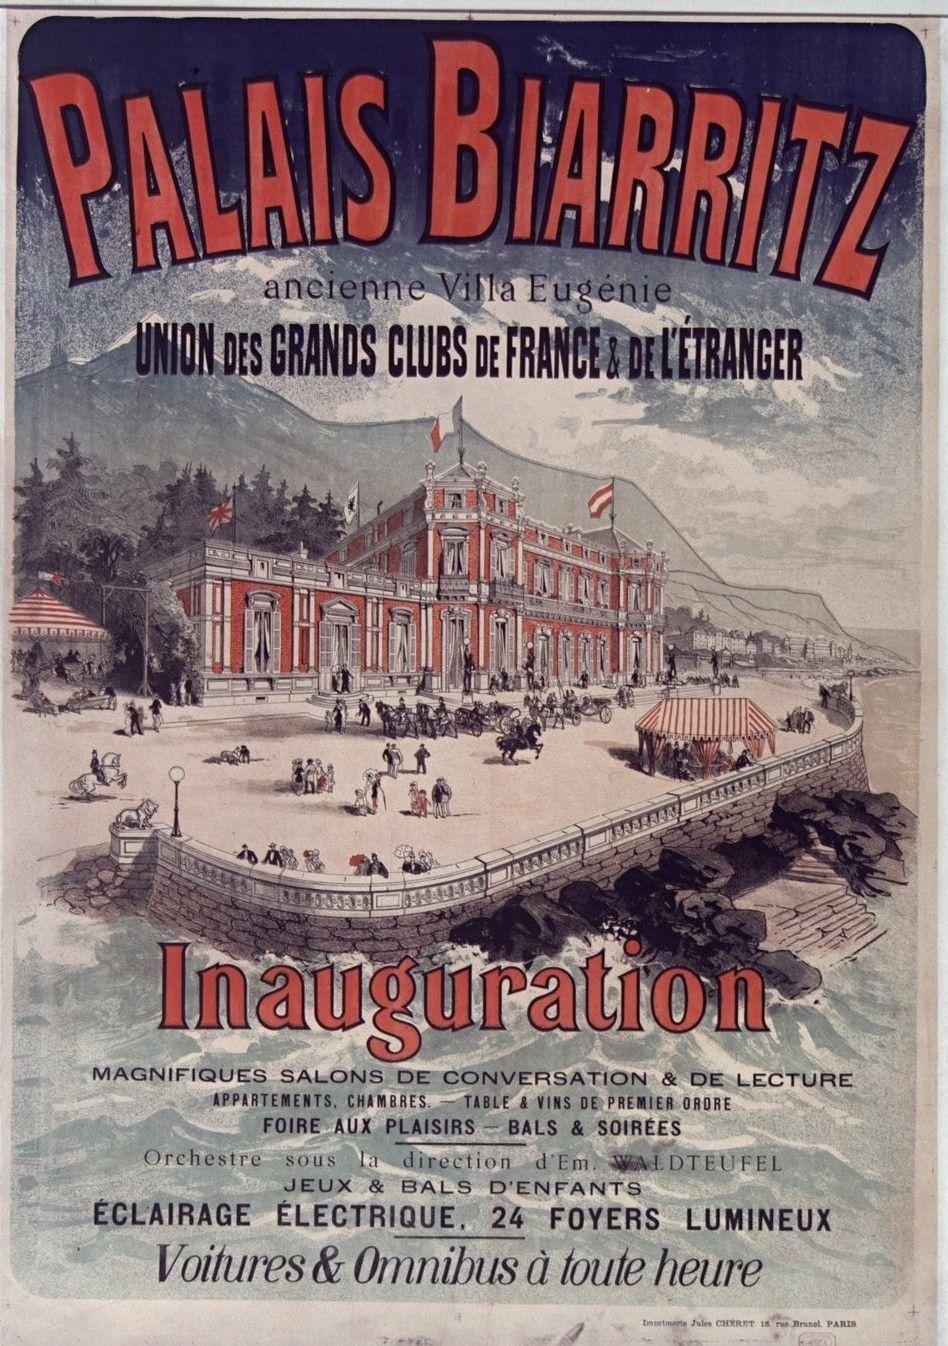 Pin By Merryvitericoleccion On Vacances De La Belle Epoque Biarritz Vintage Travel Posters Travel Posters